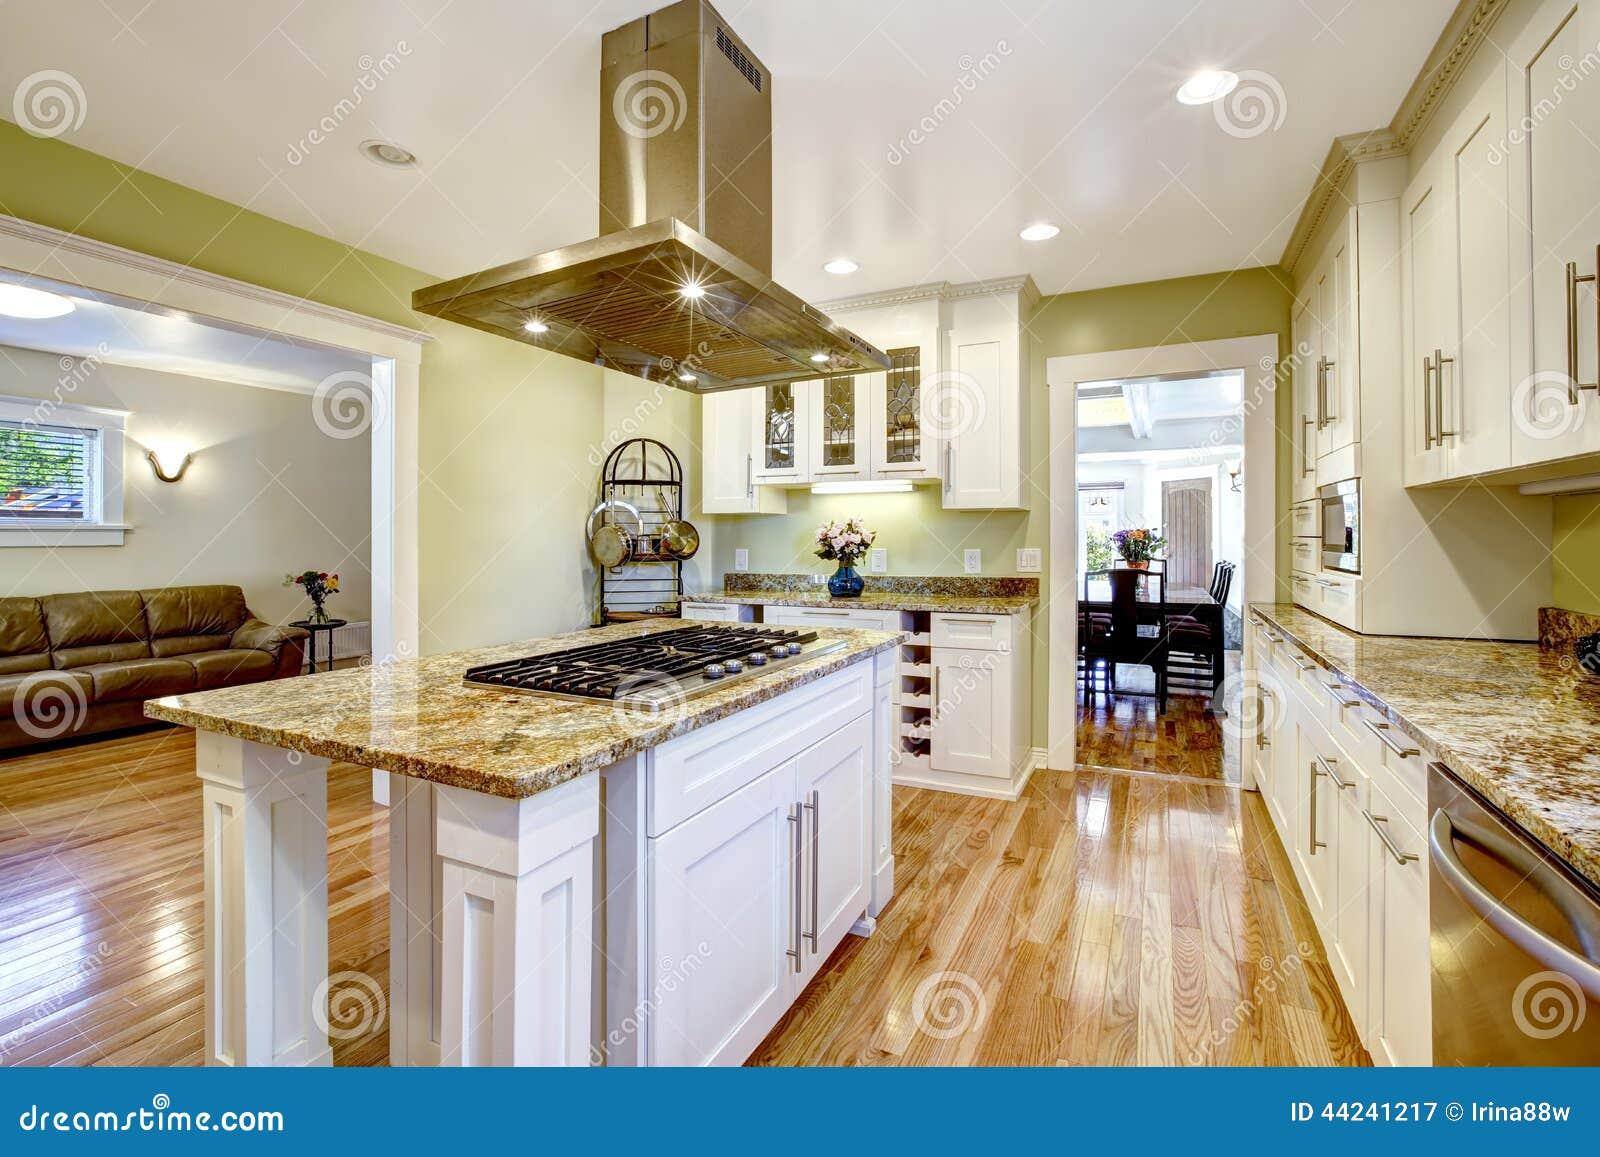 Isla de cocina con la estufa incorporada el top del for Kitchen designs that stand the test of time